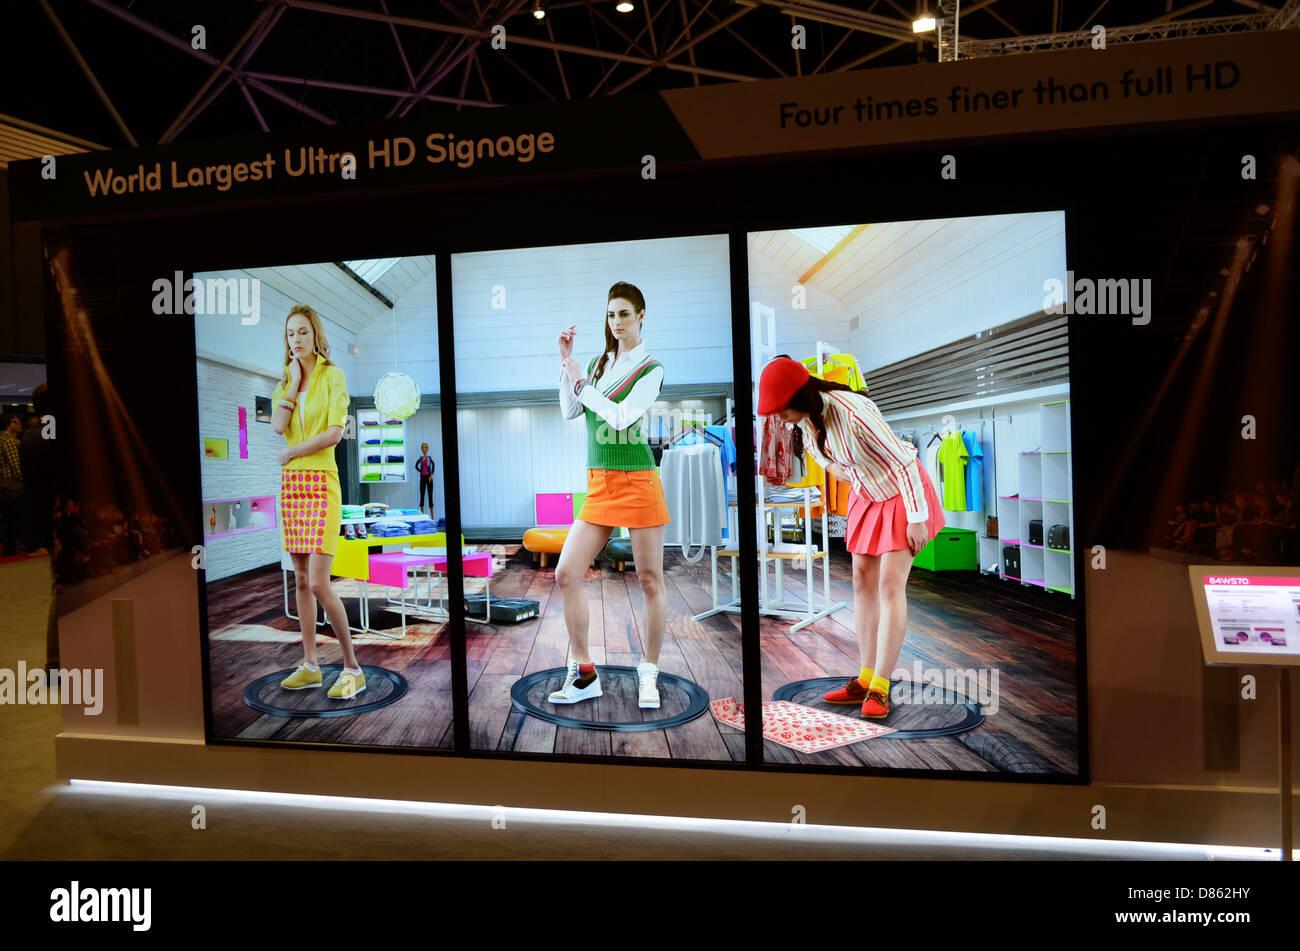 4k display - Stock Image